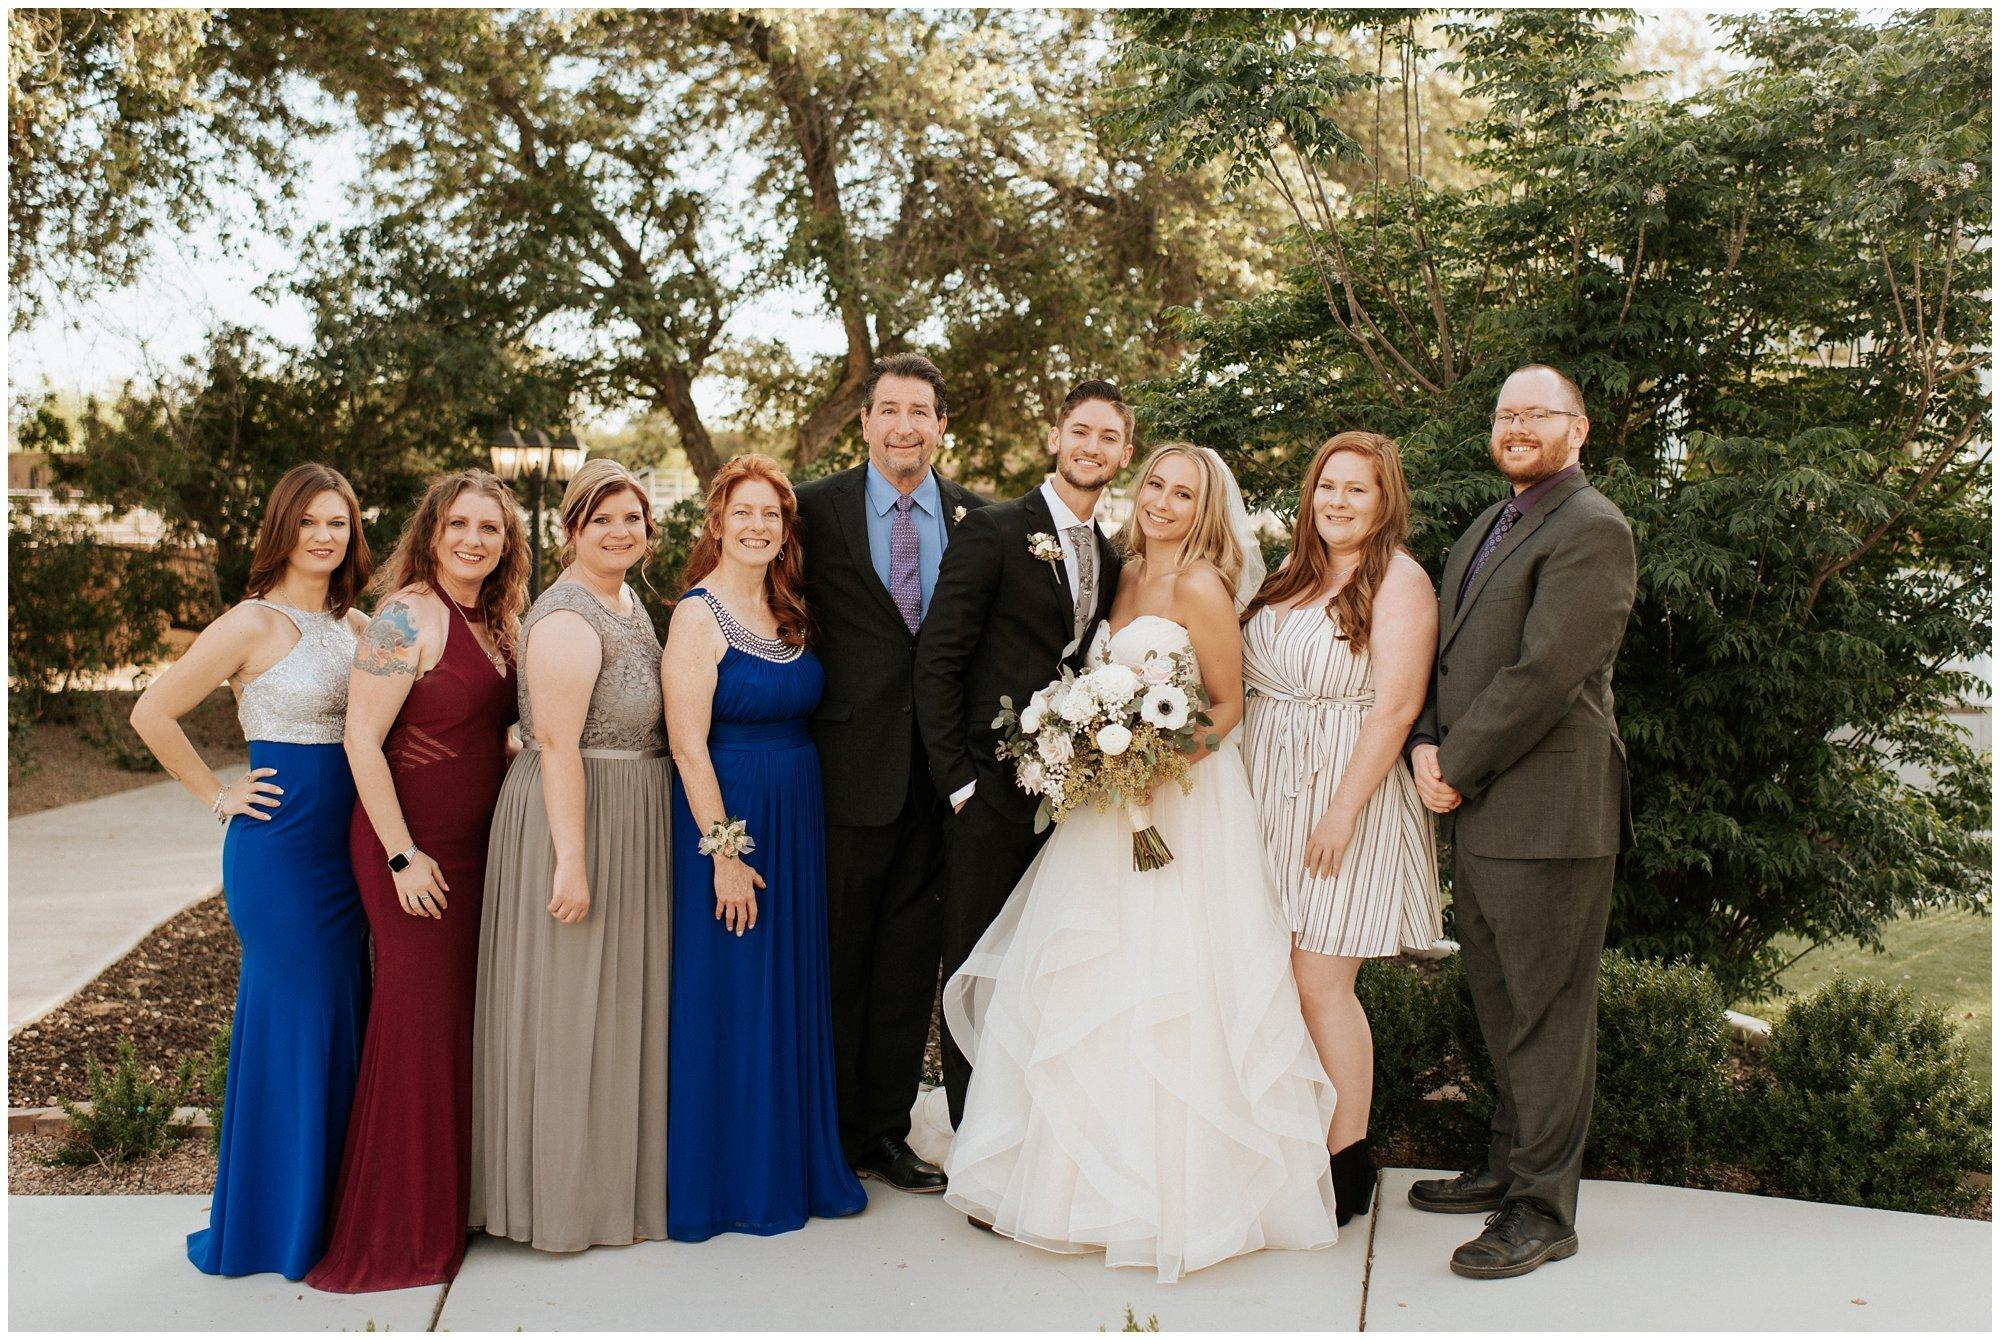 Wedgewood_Lindsay_Groves-Arizona-Wedding-Photographer-M+C_0040.jpg